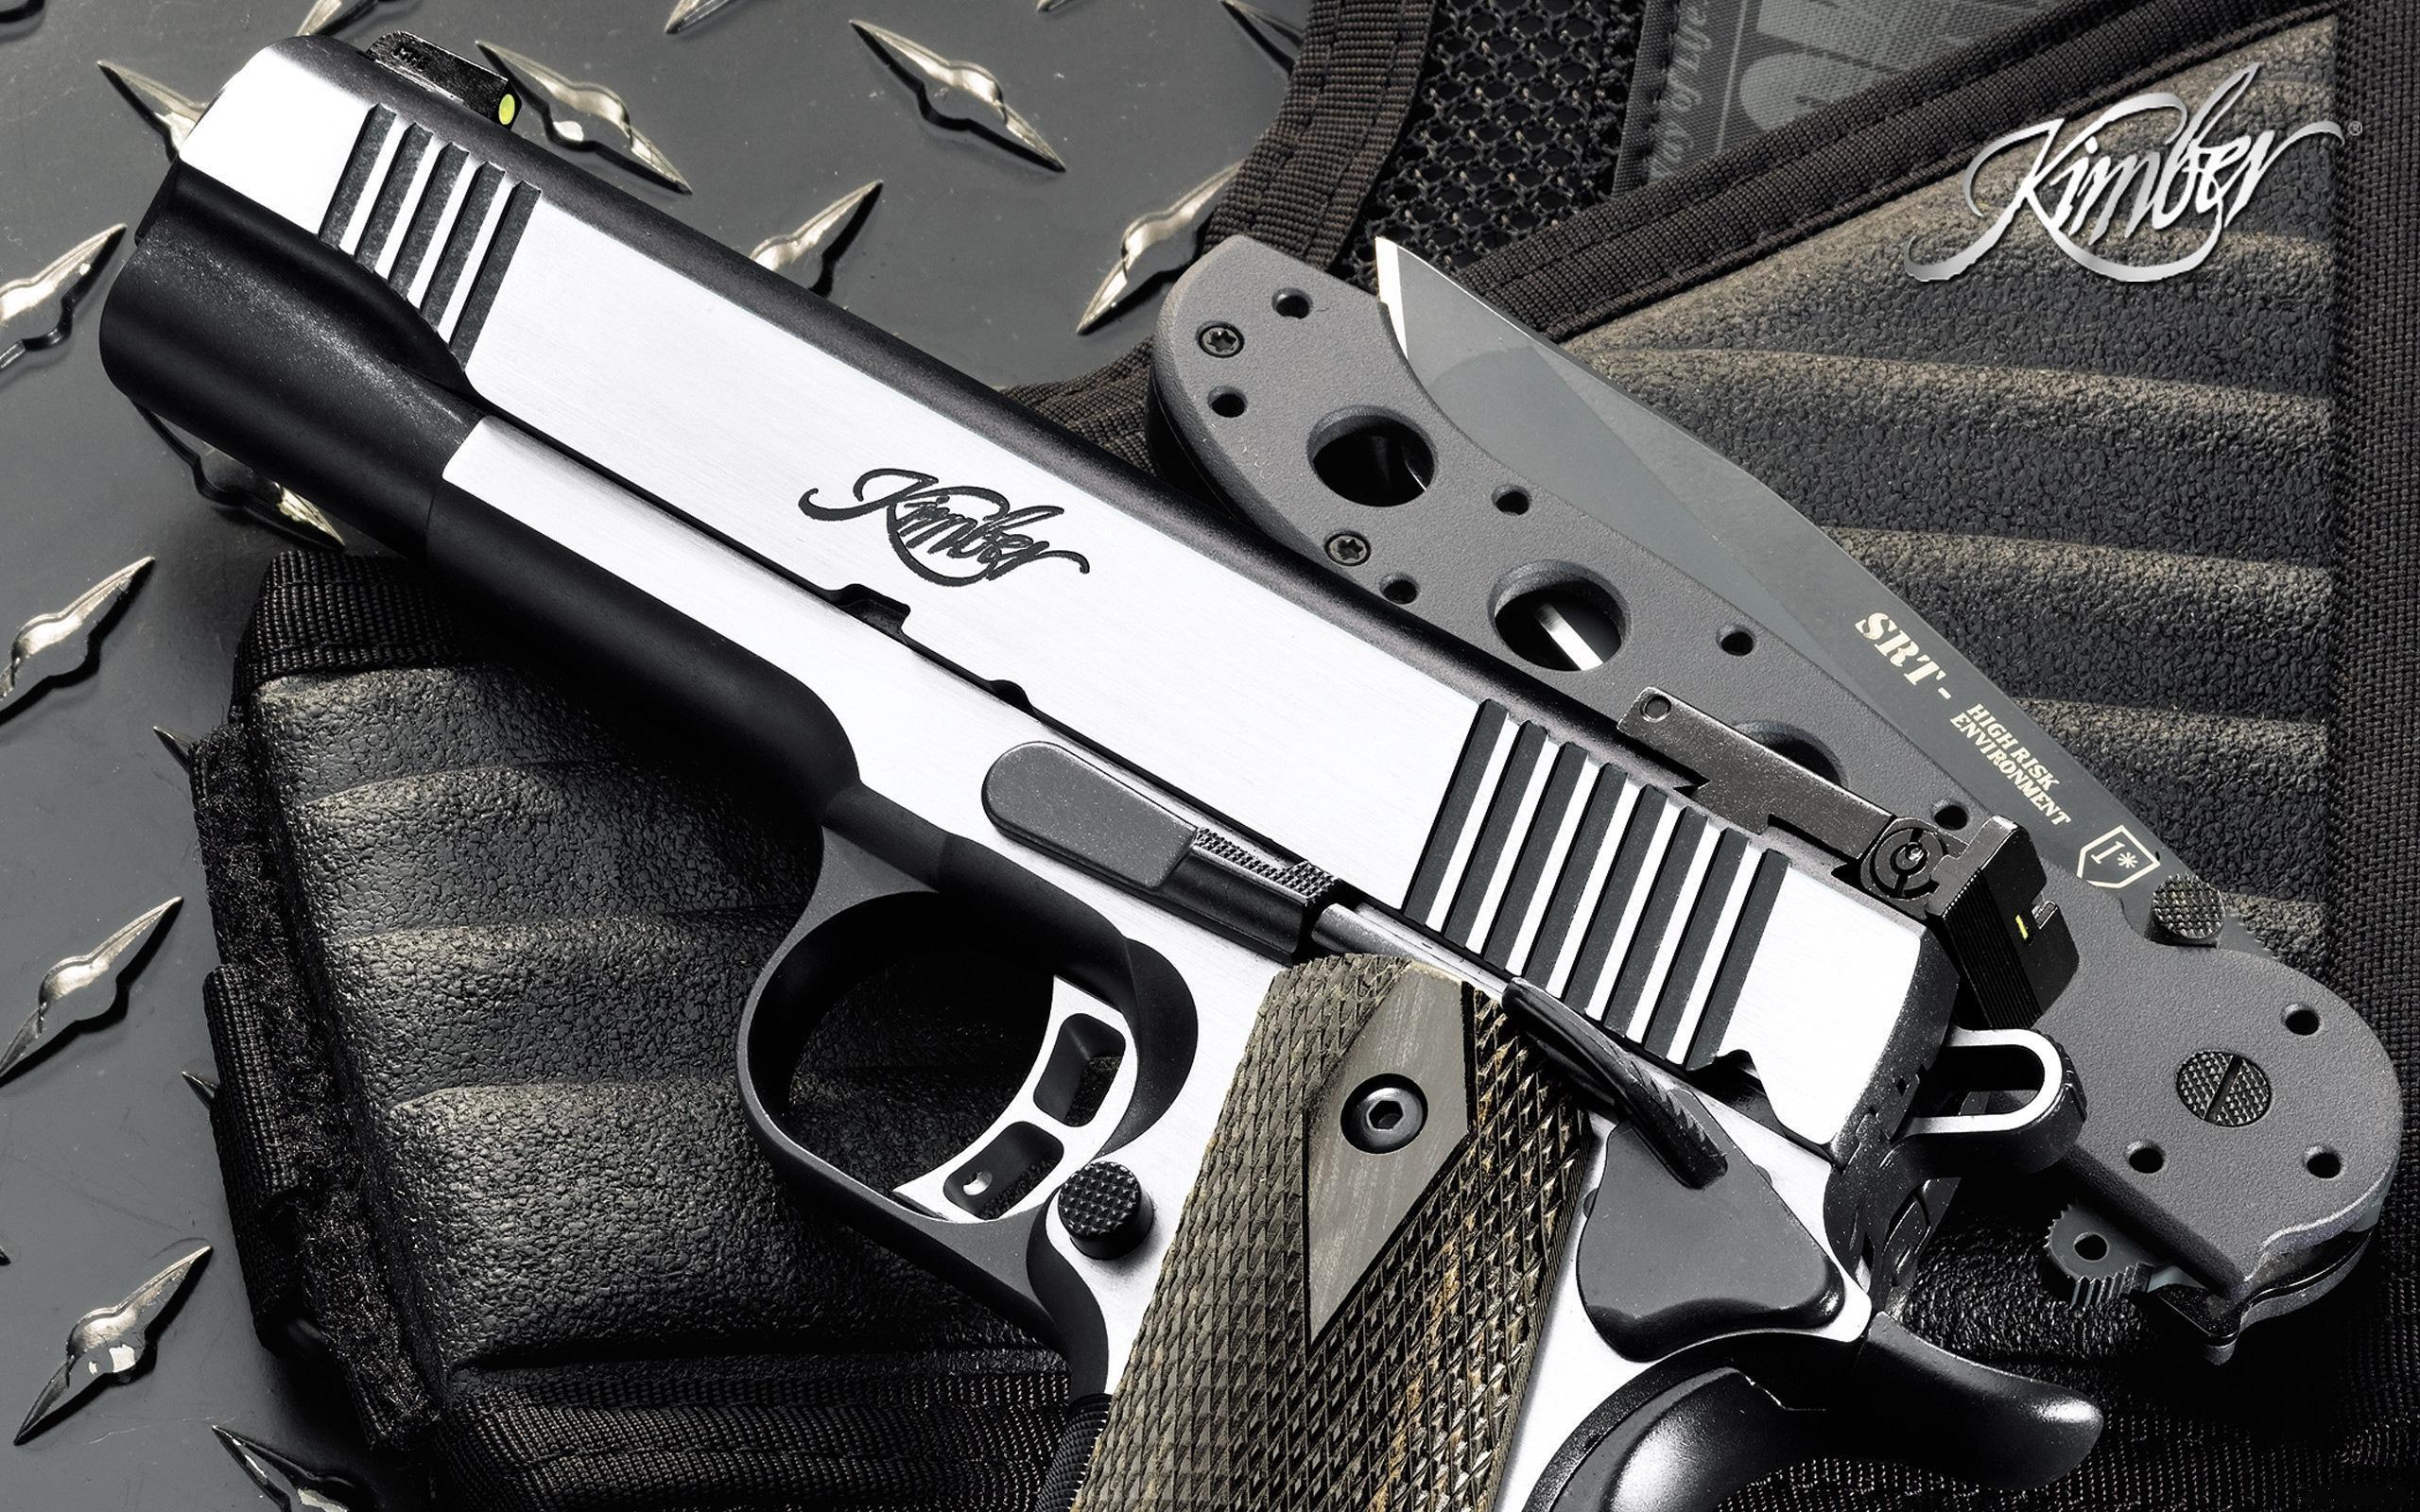 Kimber Pistol HD Wallpaper Background Image 2560x1600 ID 2560x1600